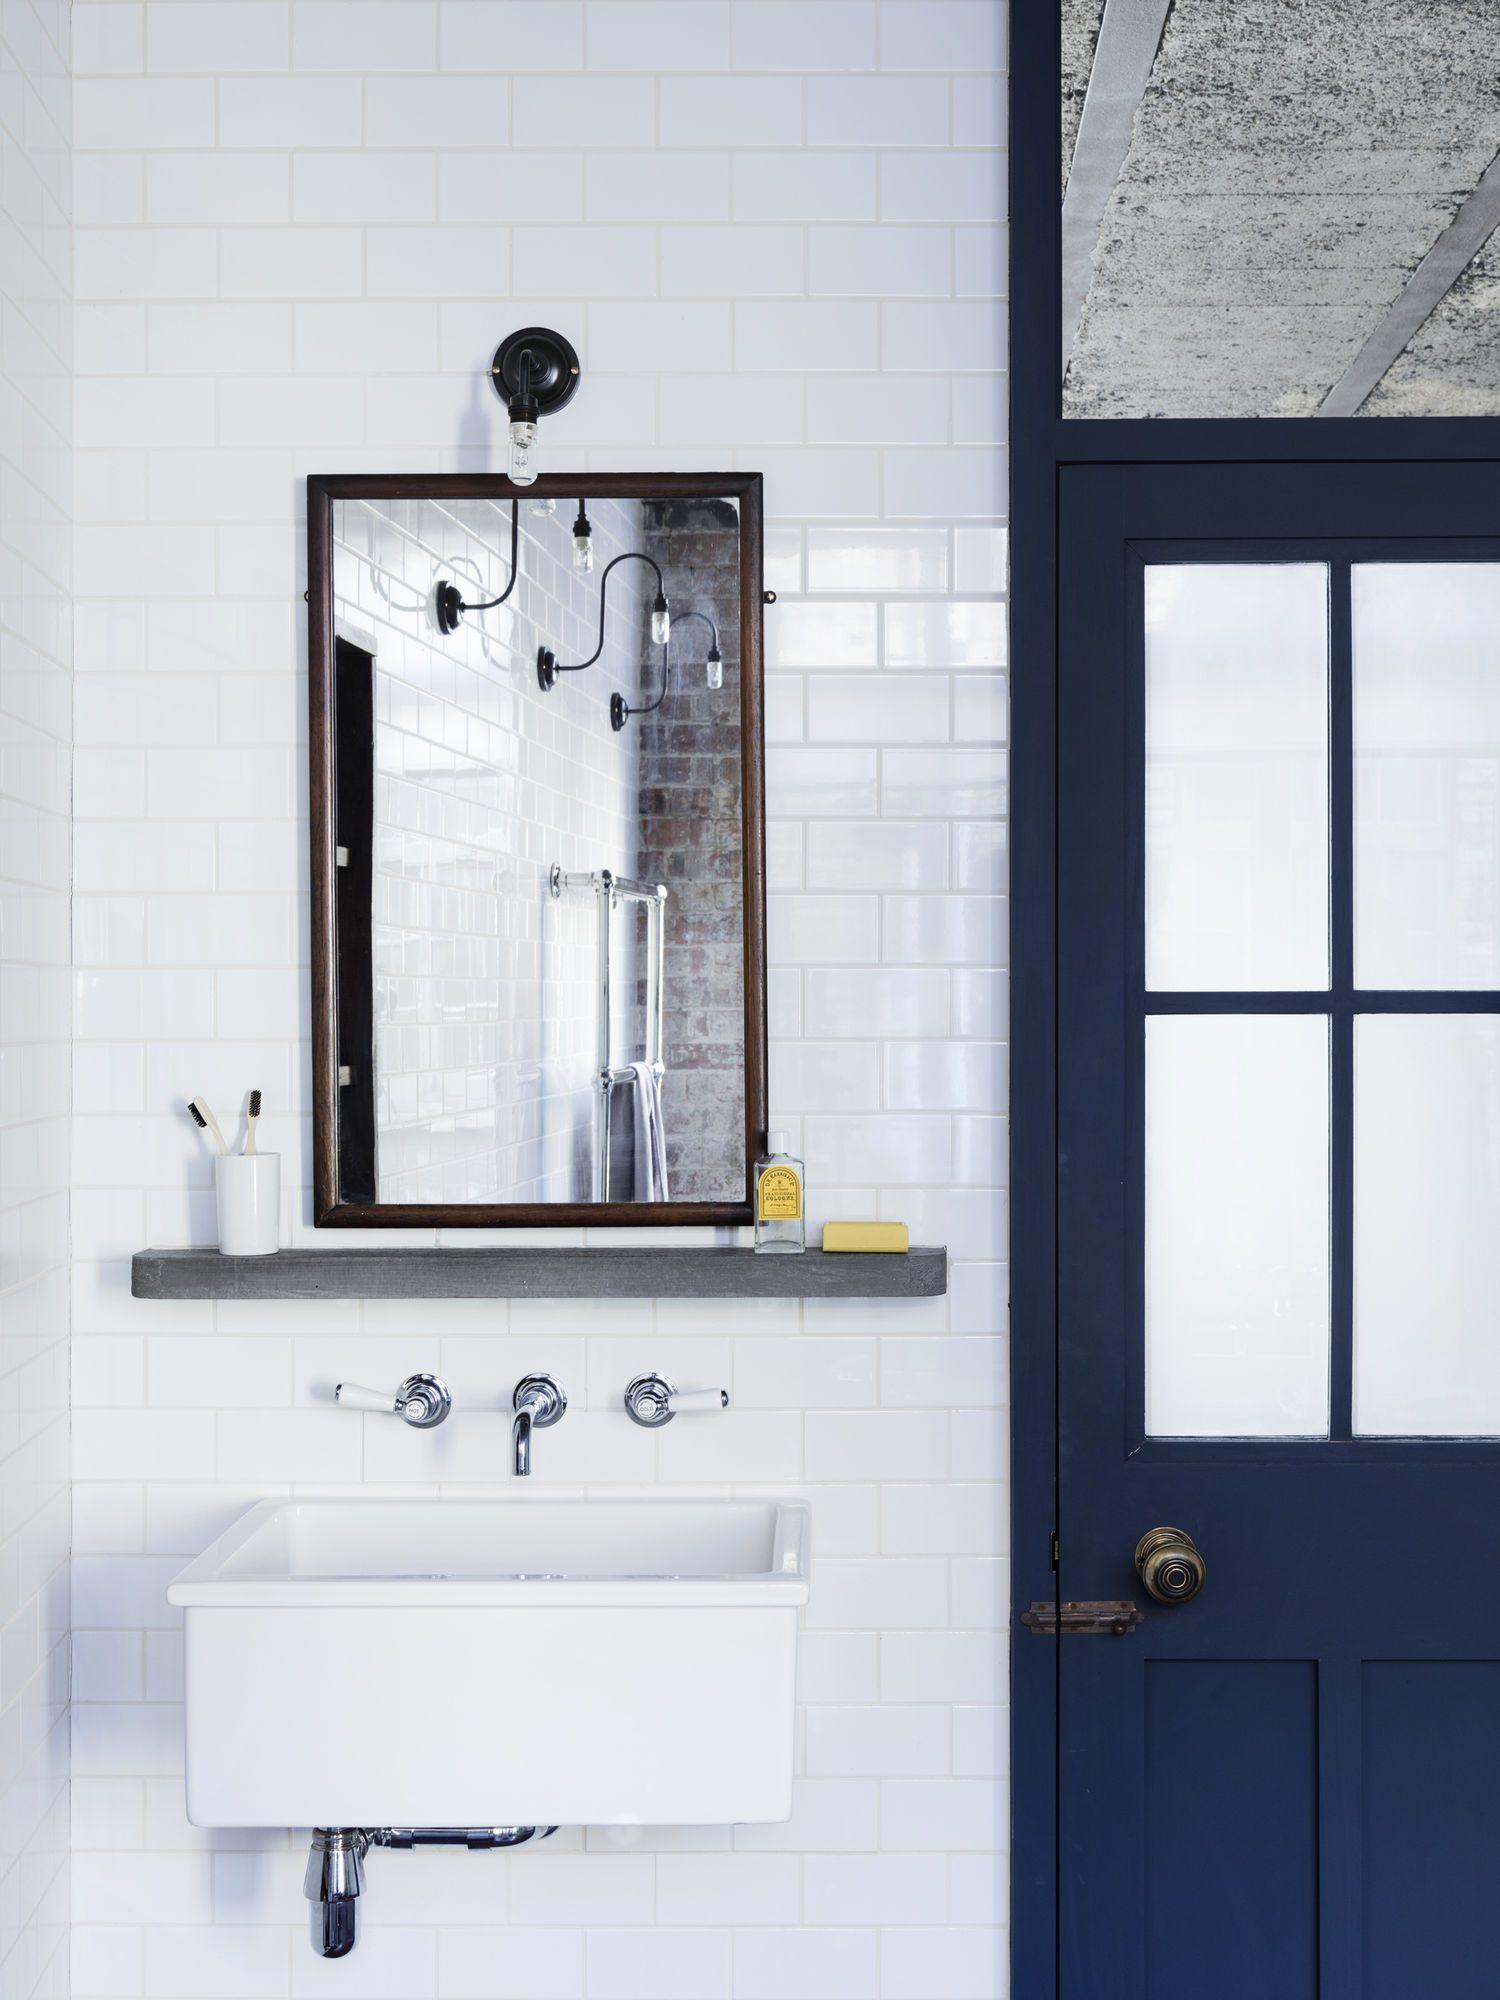 Mark Lewis Interior Design White-Tiled Bathroom, Blue Door, Rory ...